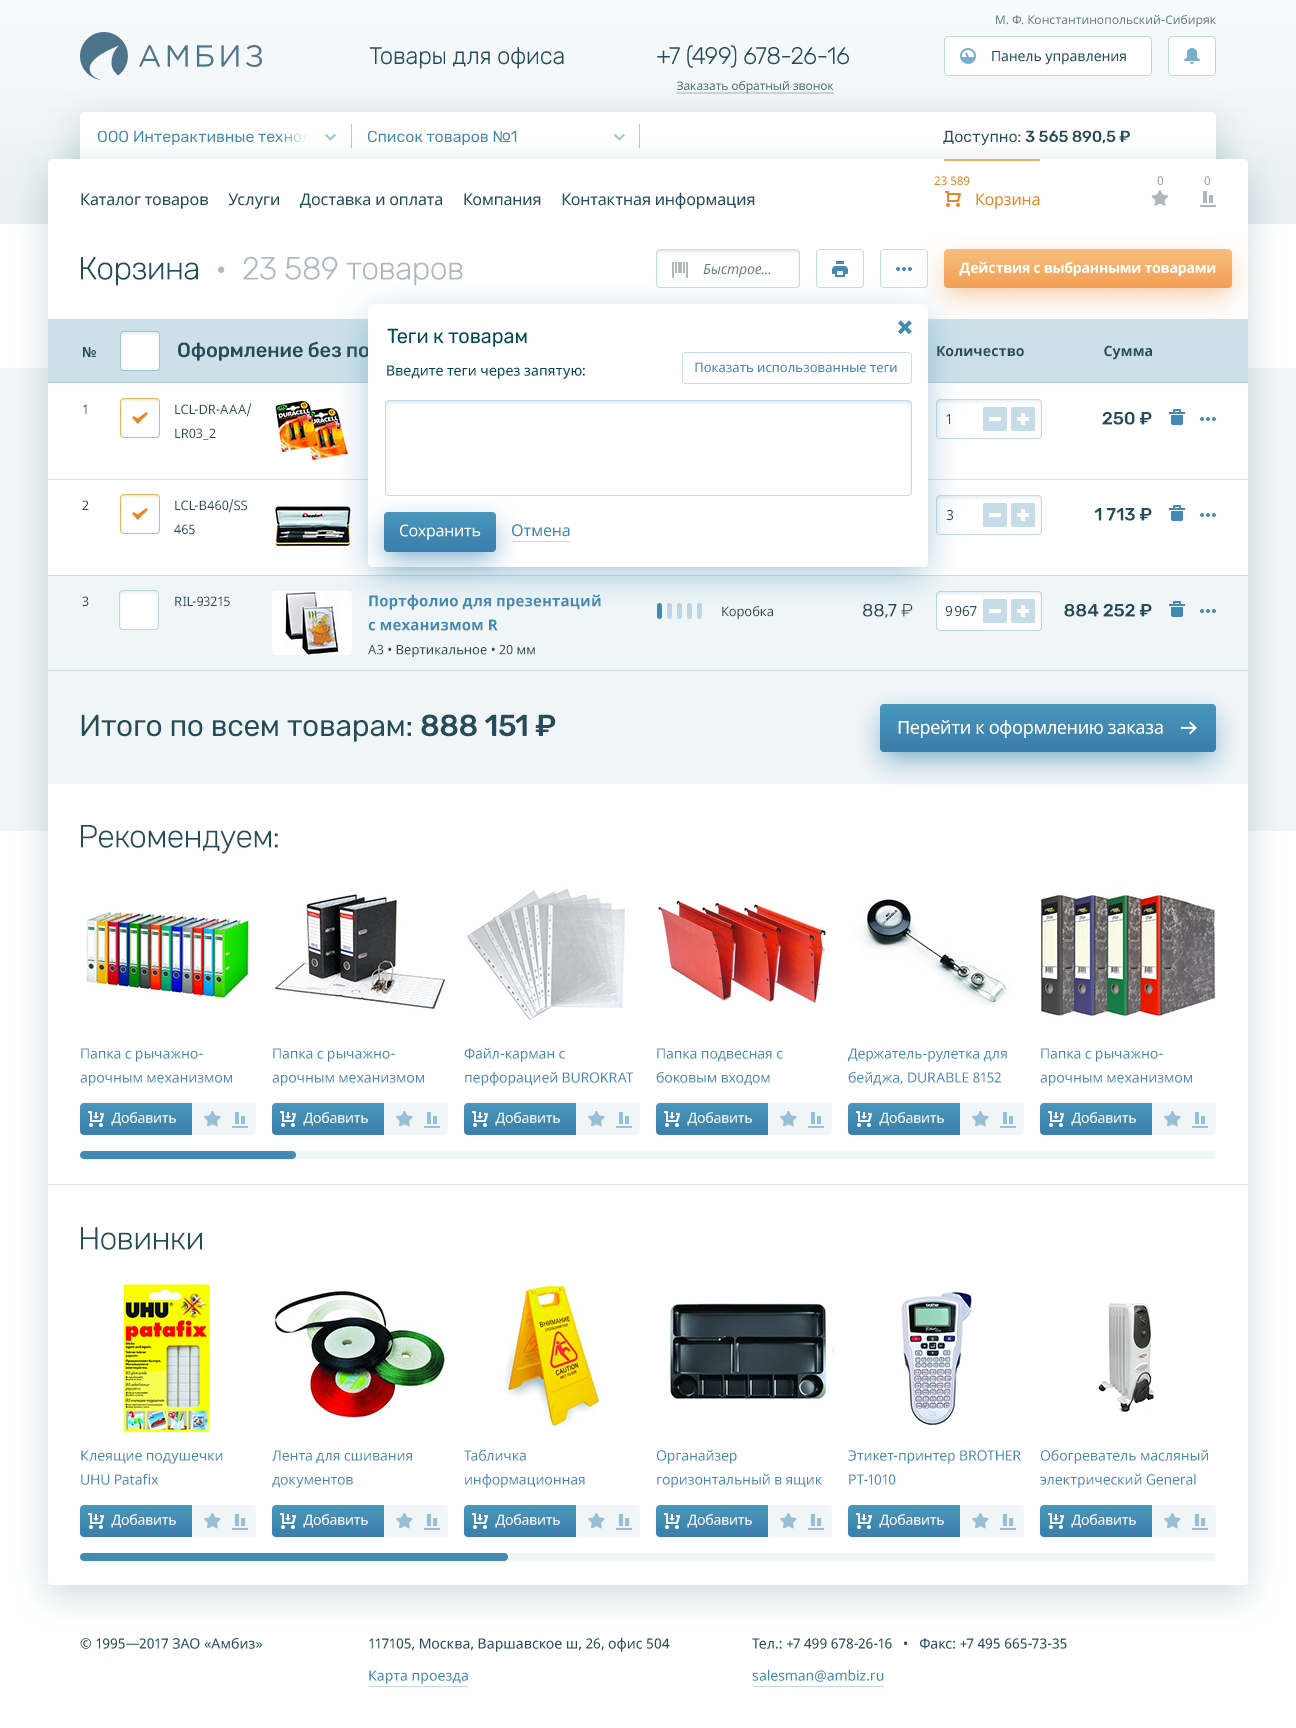 Корзина с товарами _ Операции с товарами _ Теги к товарам.png